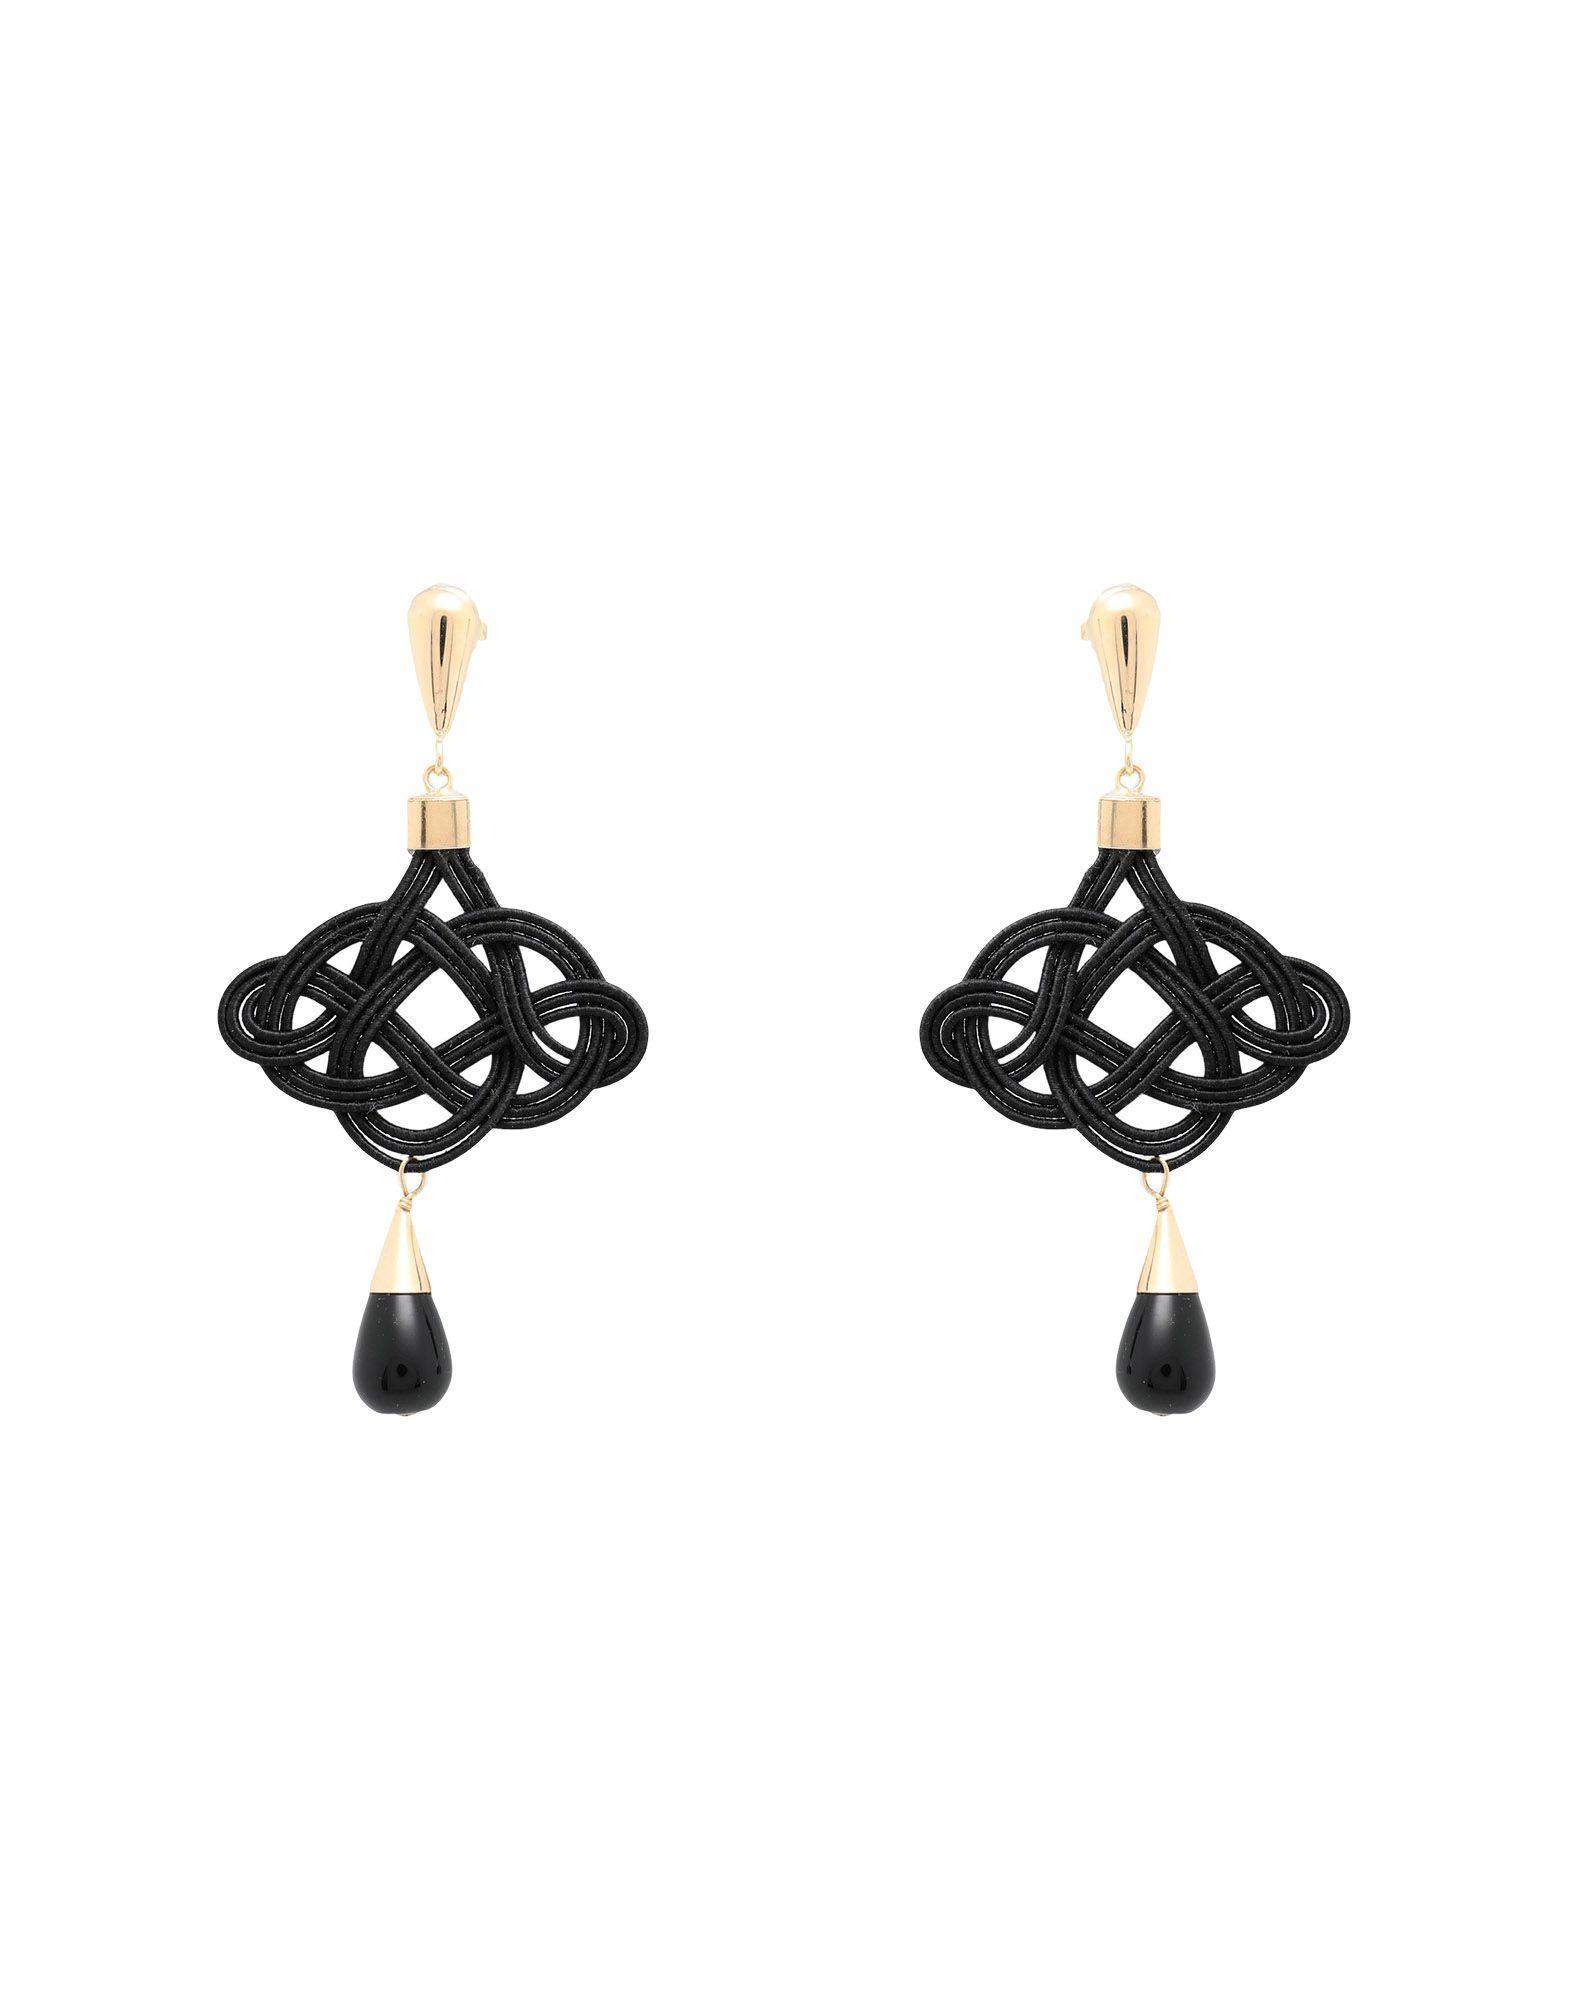 ANNA E ALEX Earrings in Black